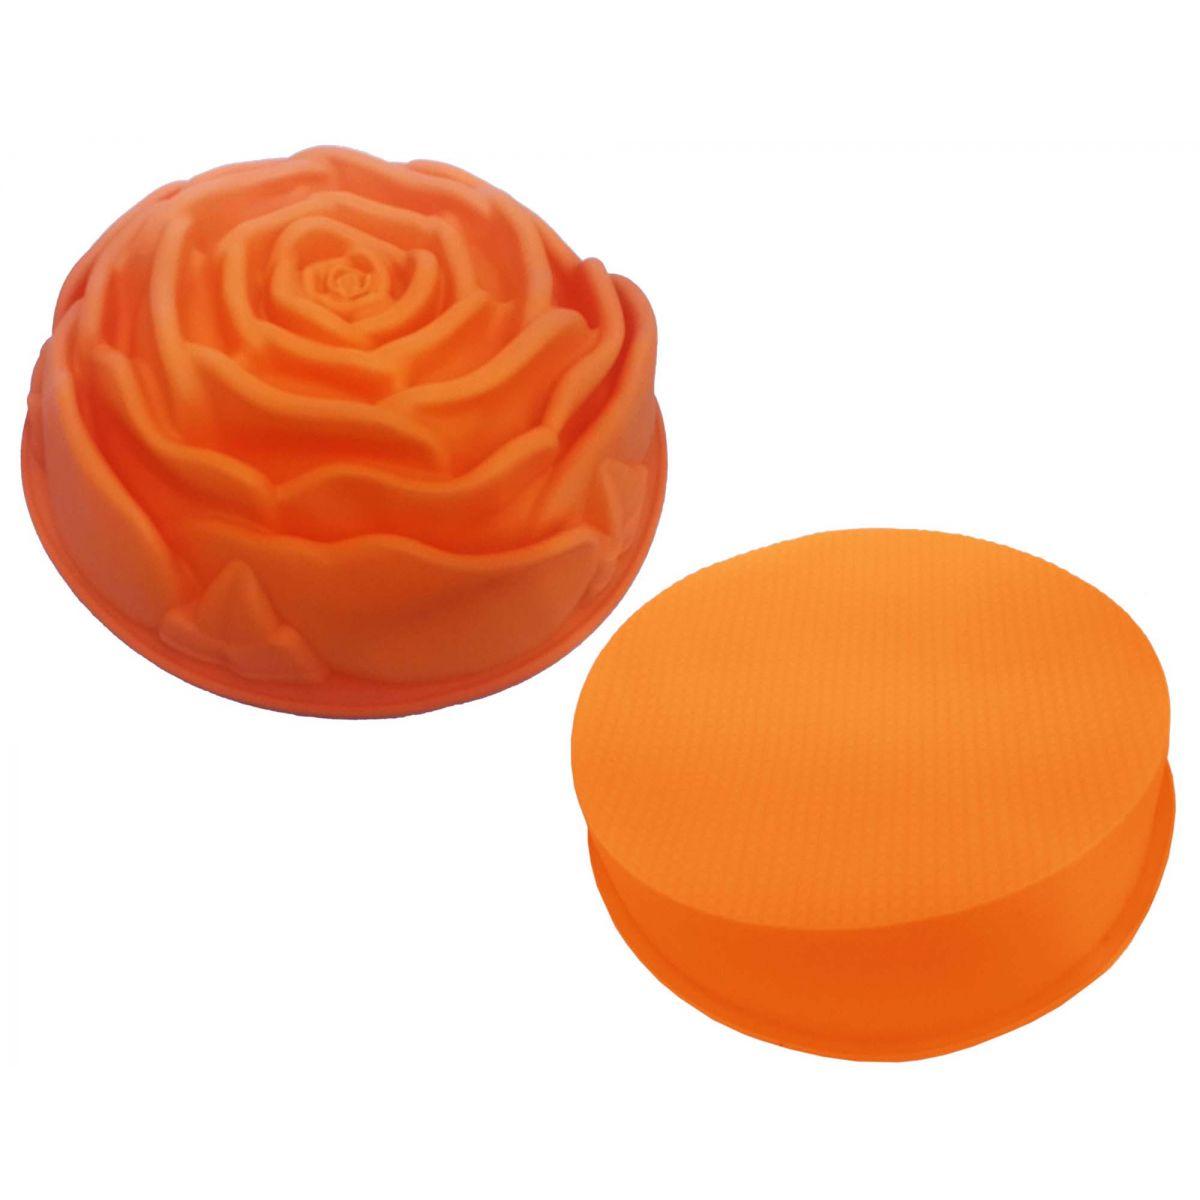 Conjunto de Silicone Para Cozinha 2 Formas Torta Doce Redonda e Flor Abobora (kit2-sili-6-11)